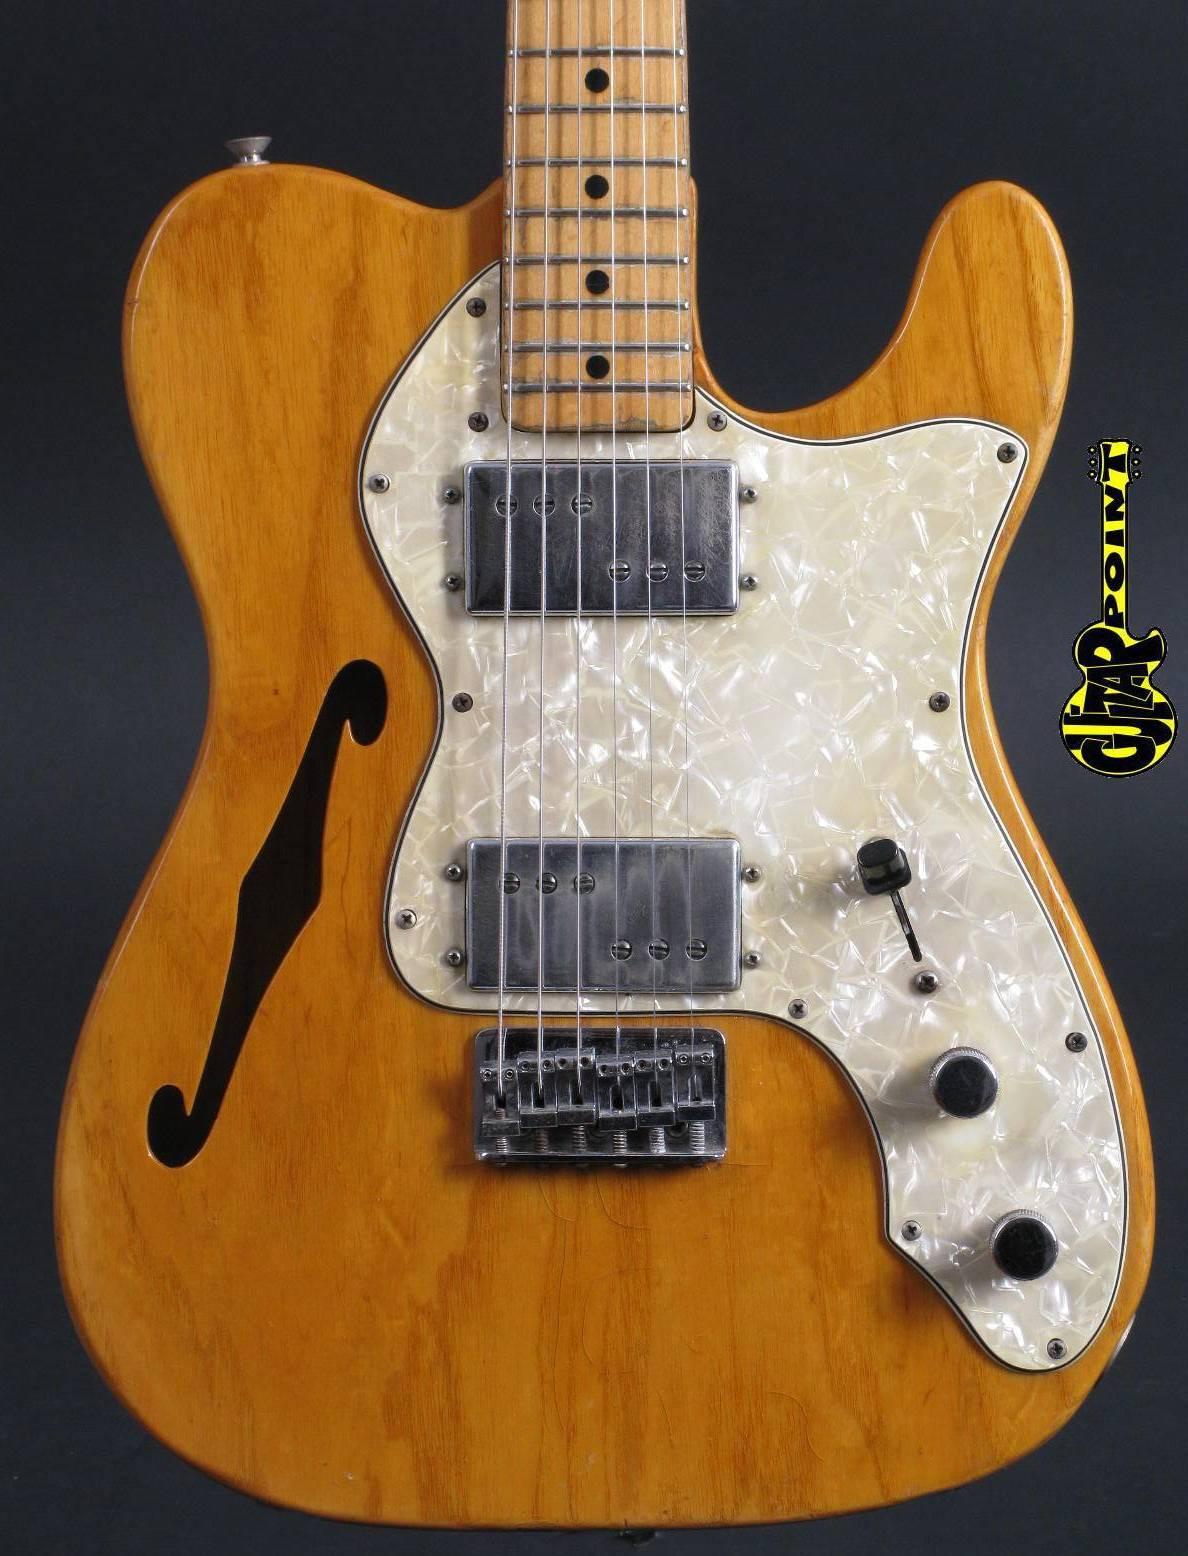 1973 Fender Telecaster Thinline II - Natural Ash